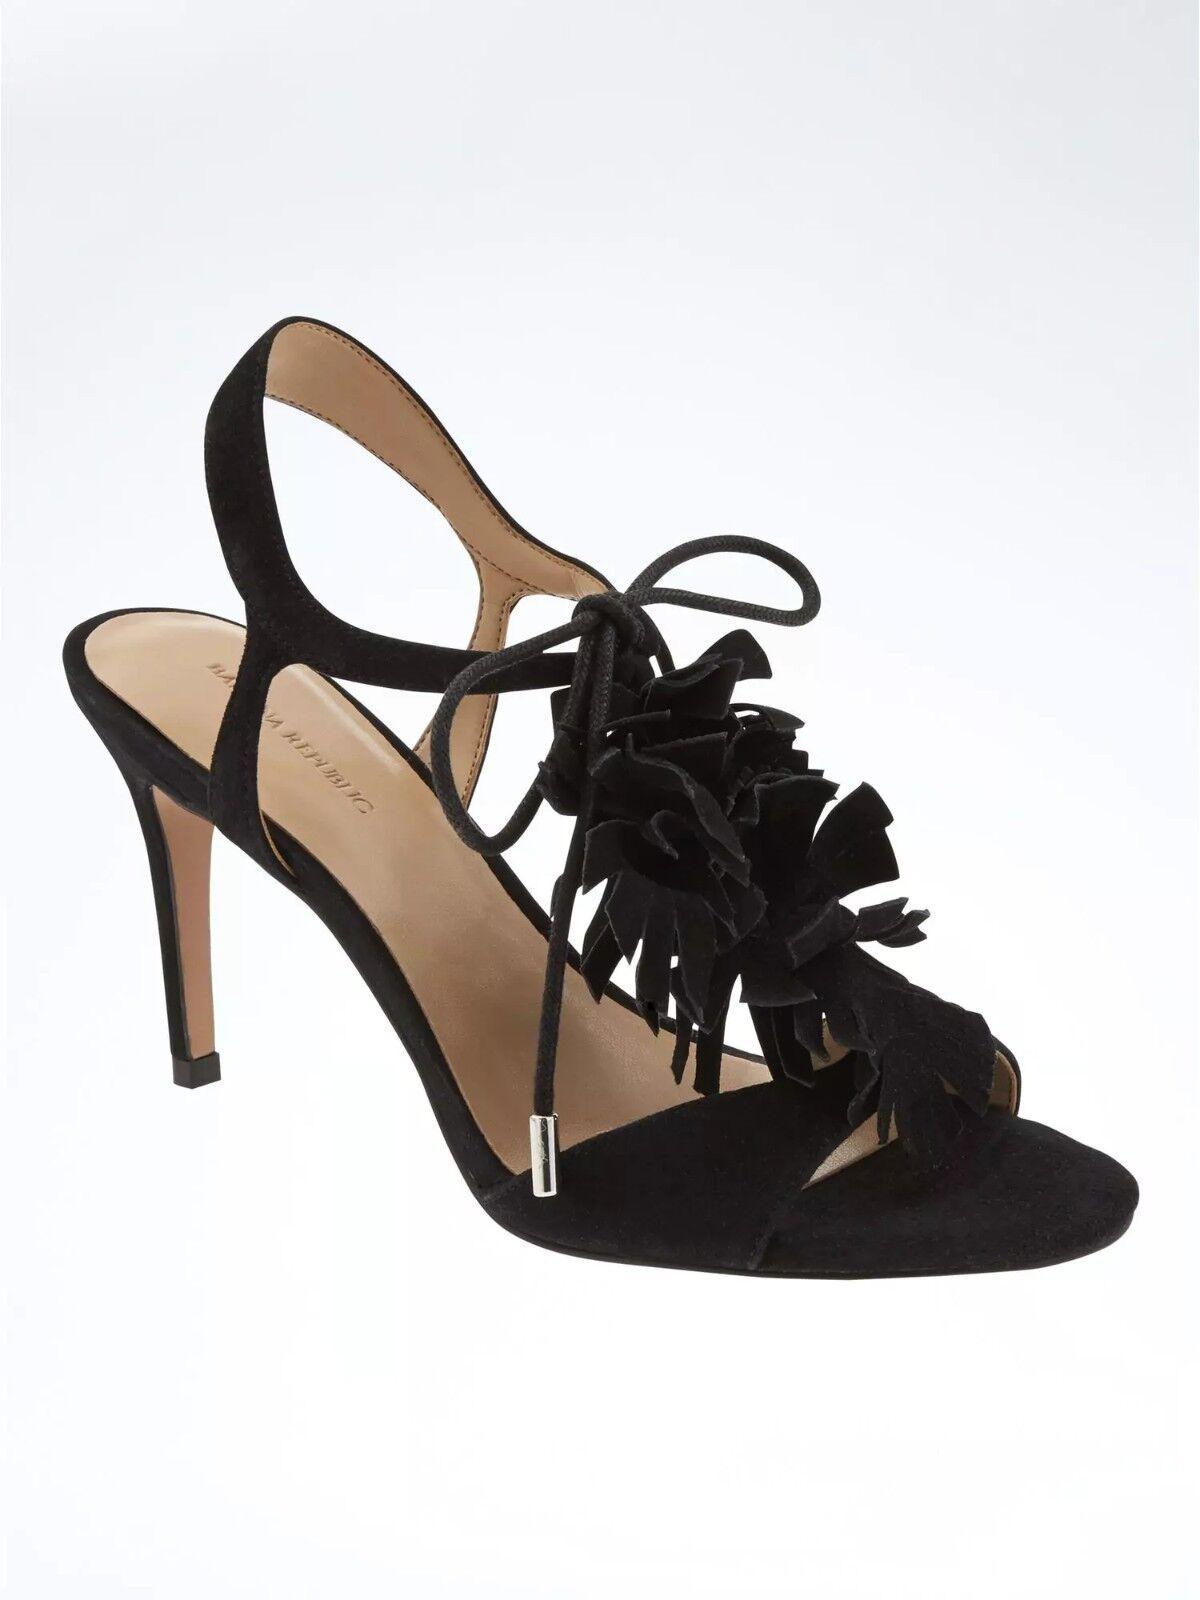 Banana Republic T-Strap High Heel Sandale, Biscotti SIZE 7 M       #683619 v615